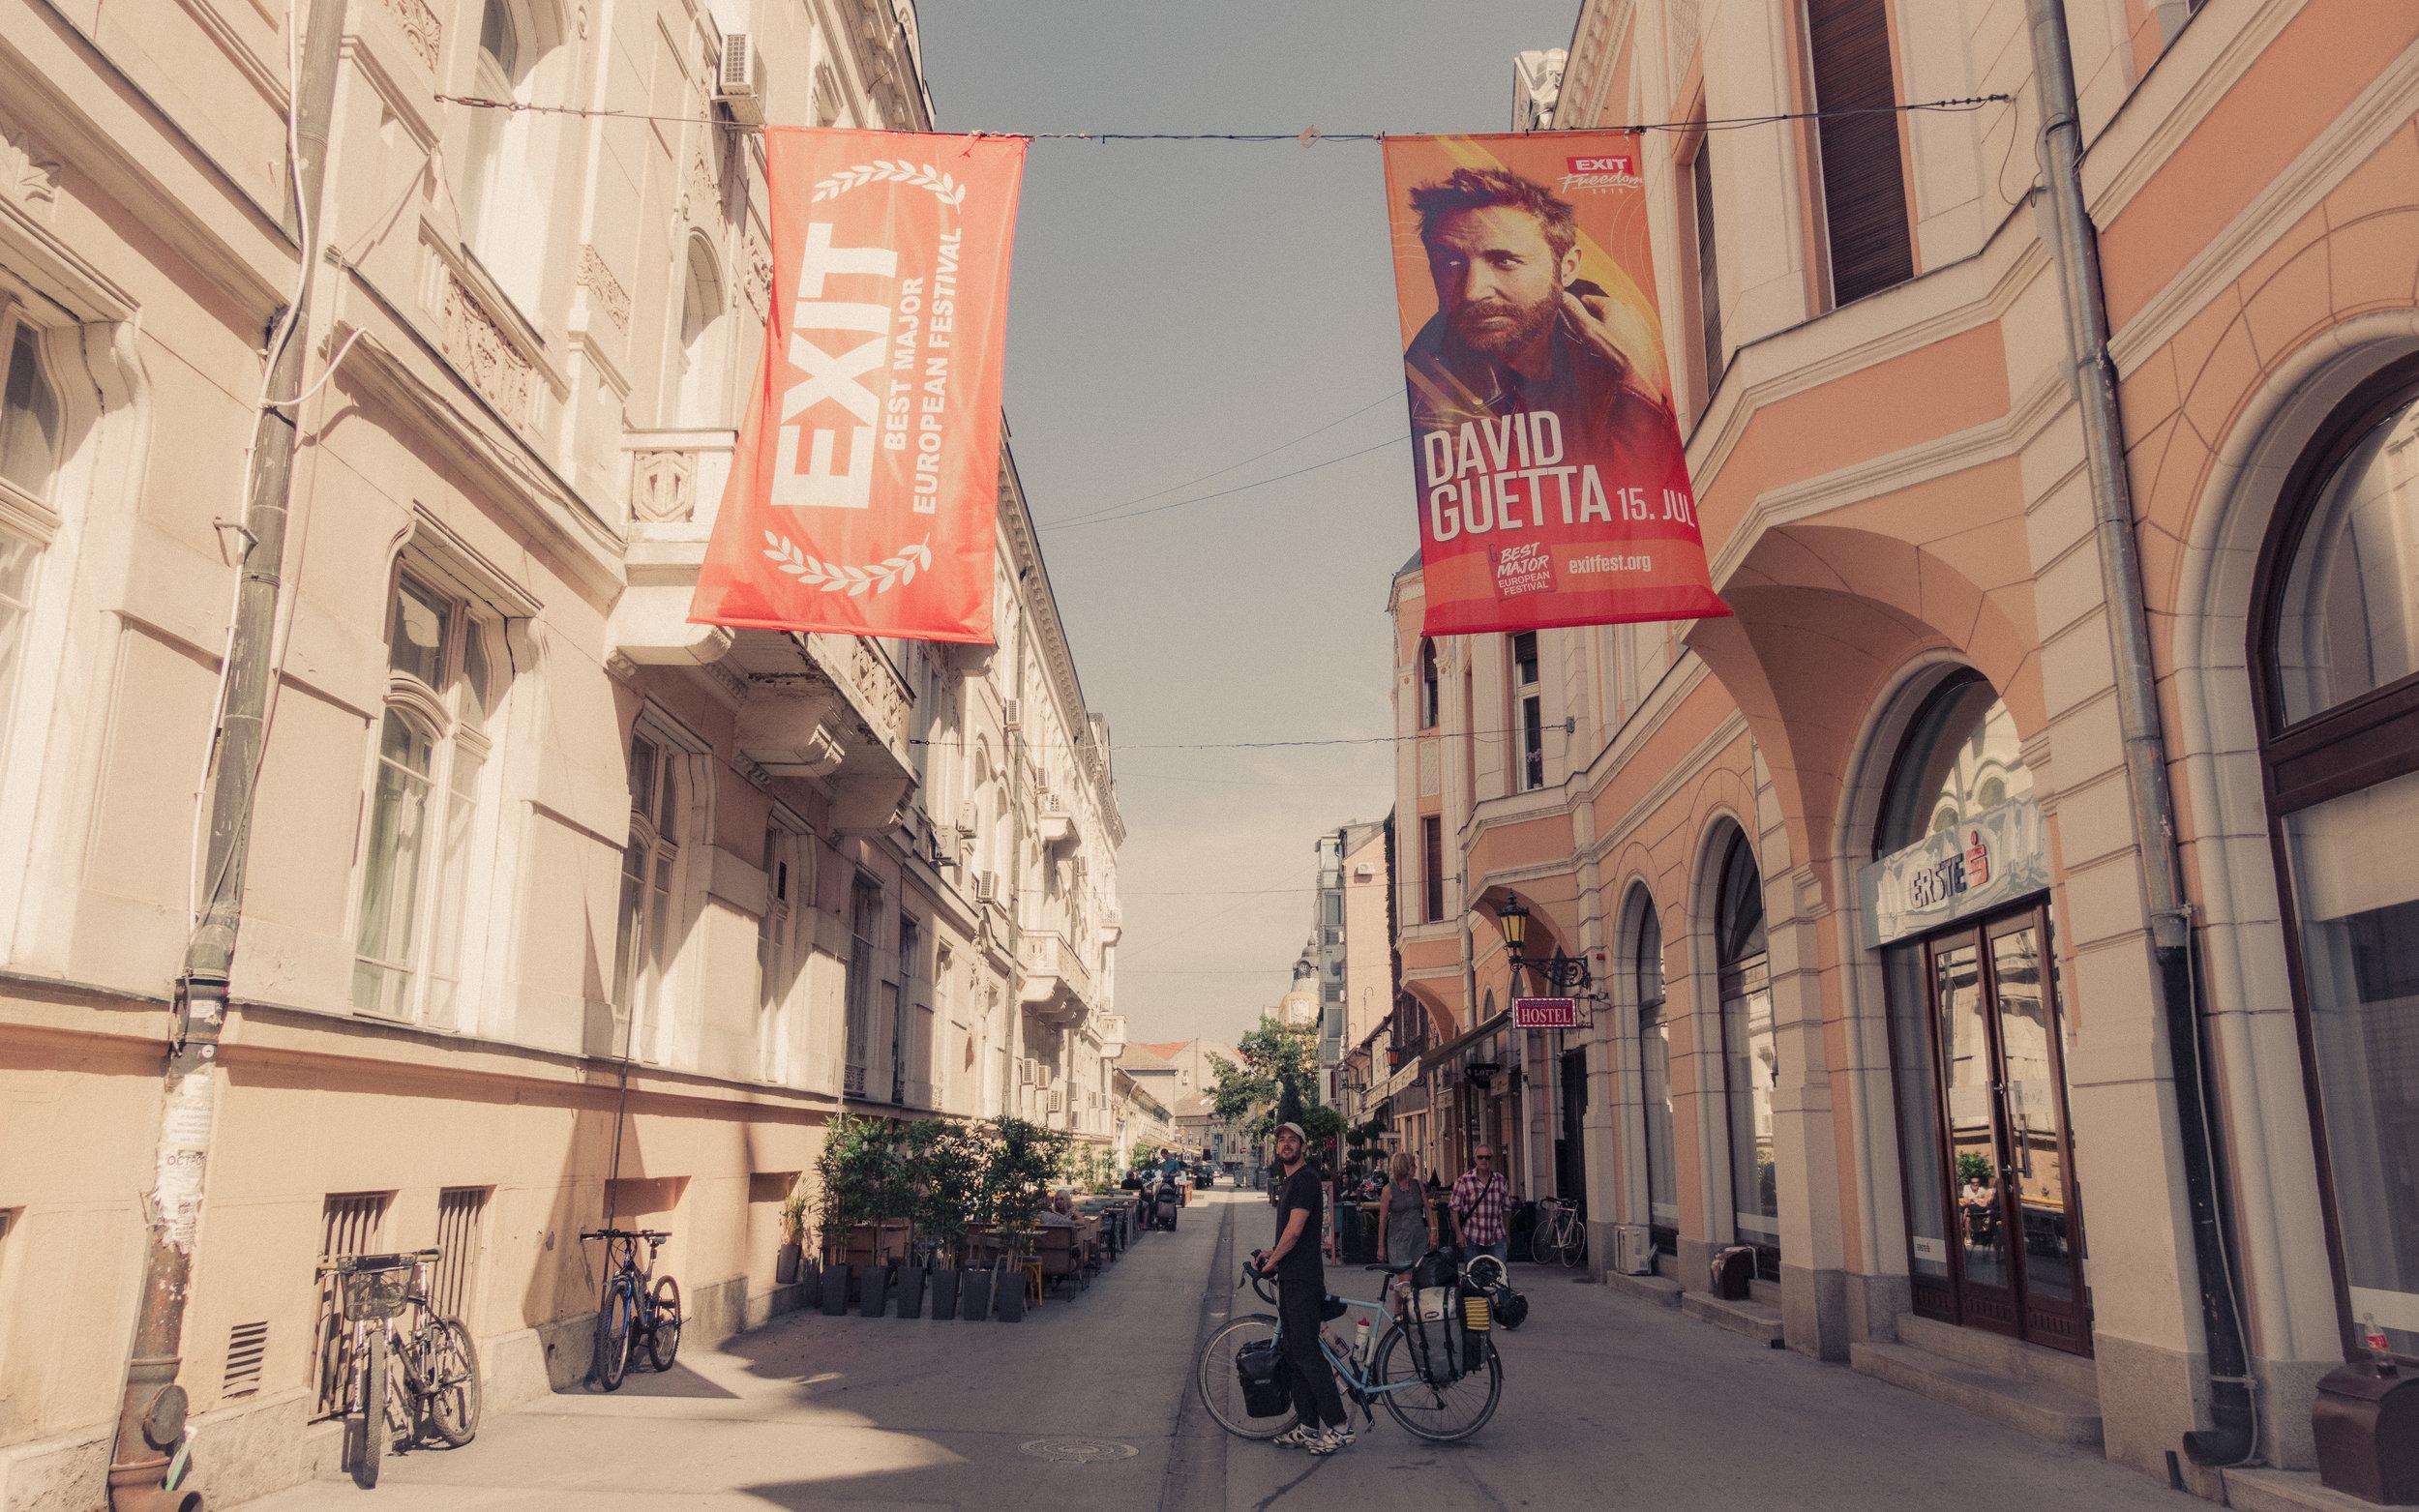 EXIT festival, Novi Sad